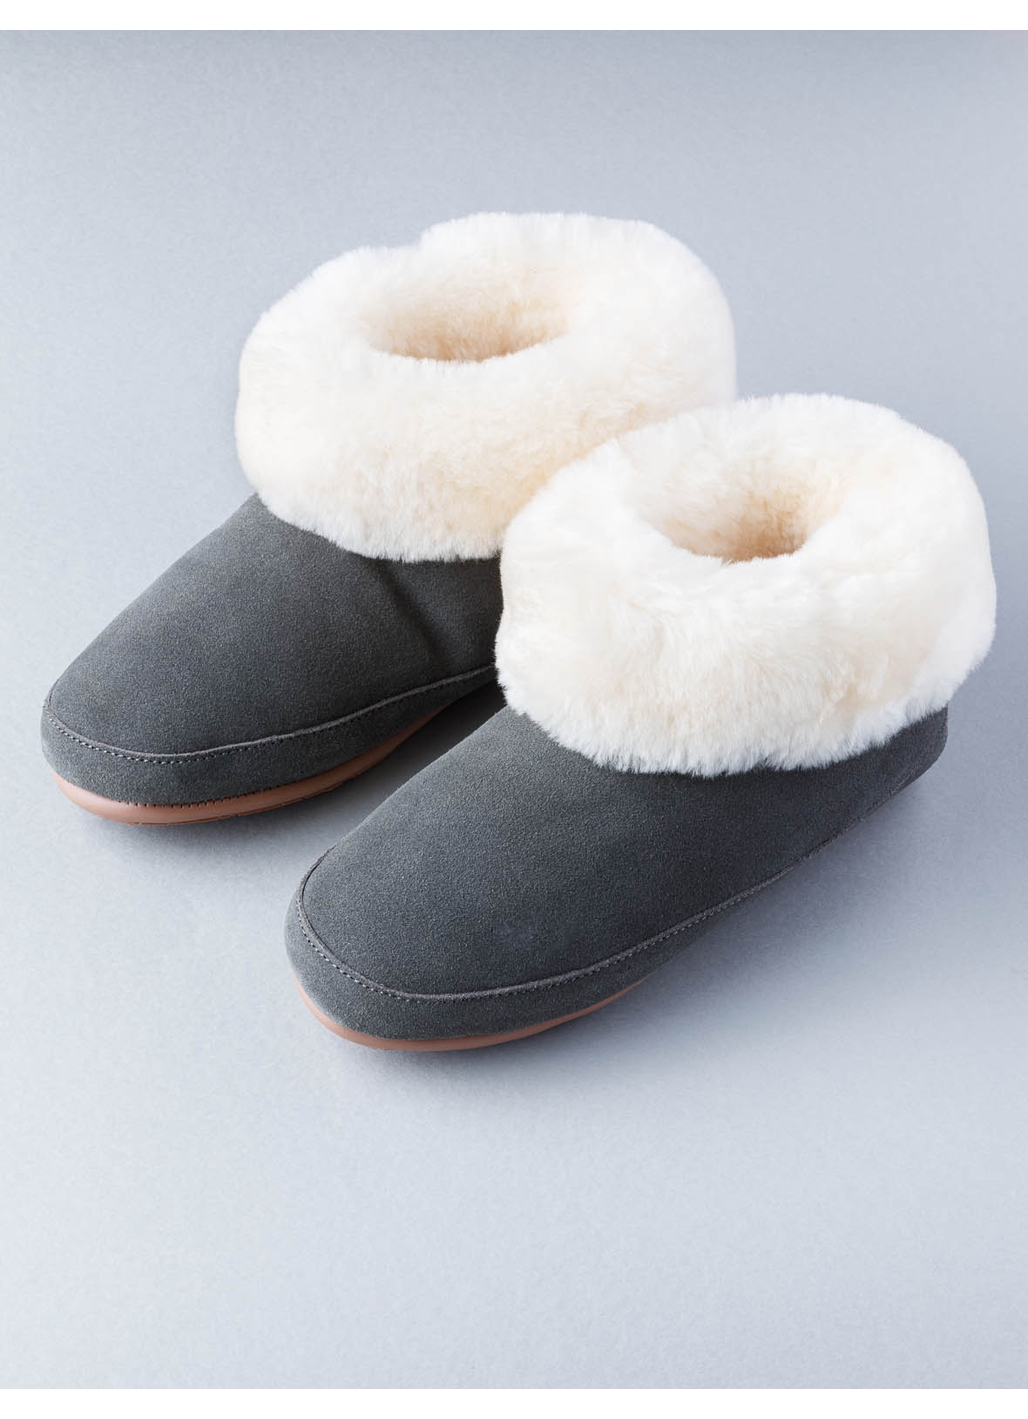 Ladies Sheepskin Boot Slippers in Dark Grey